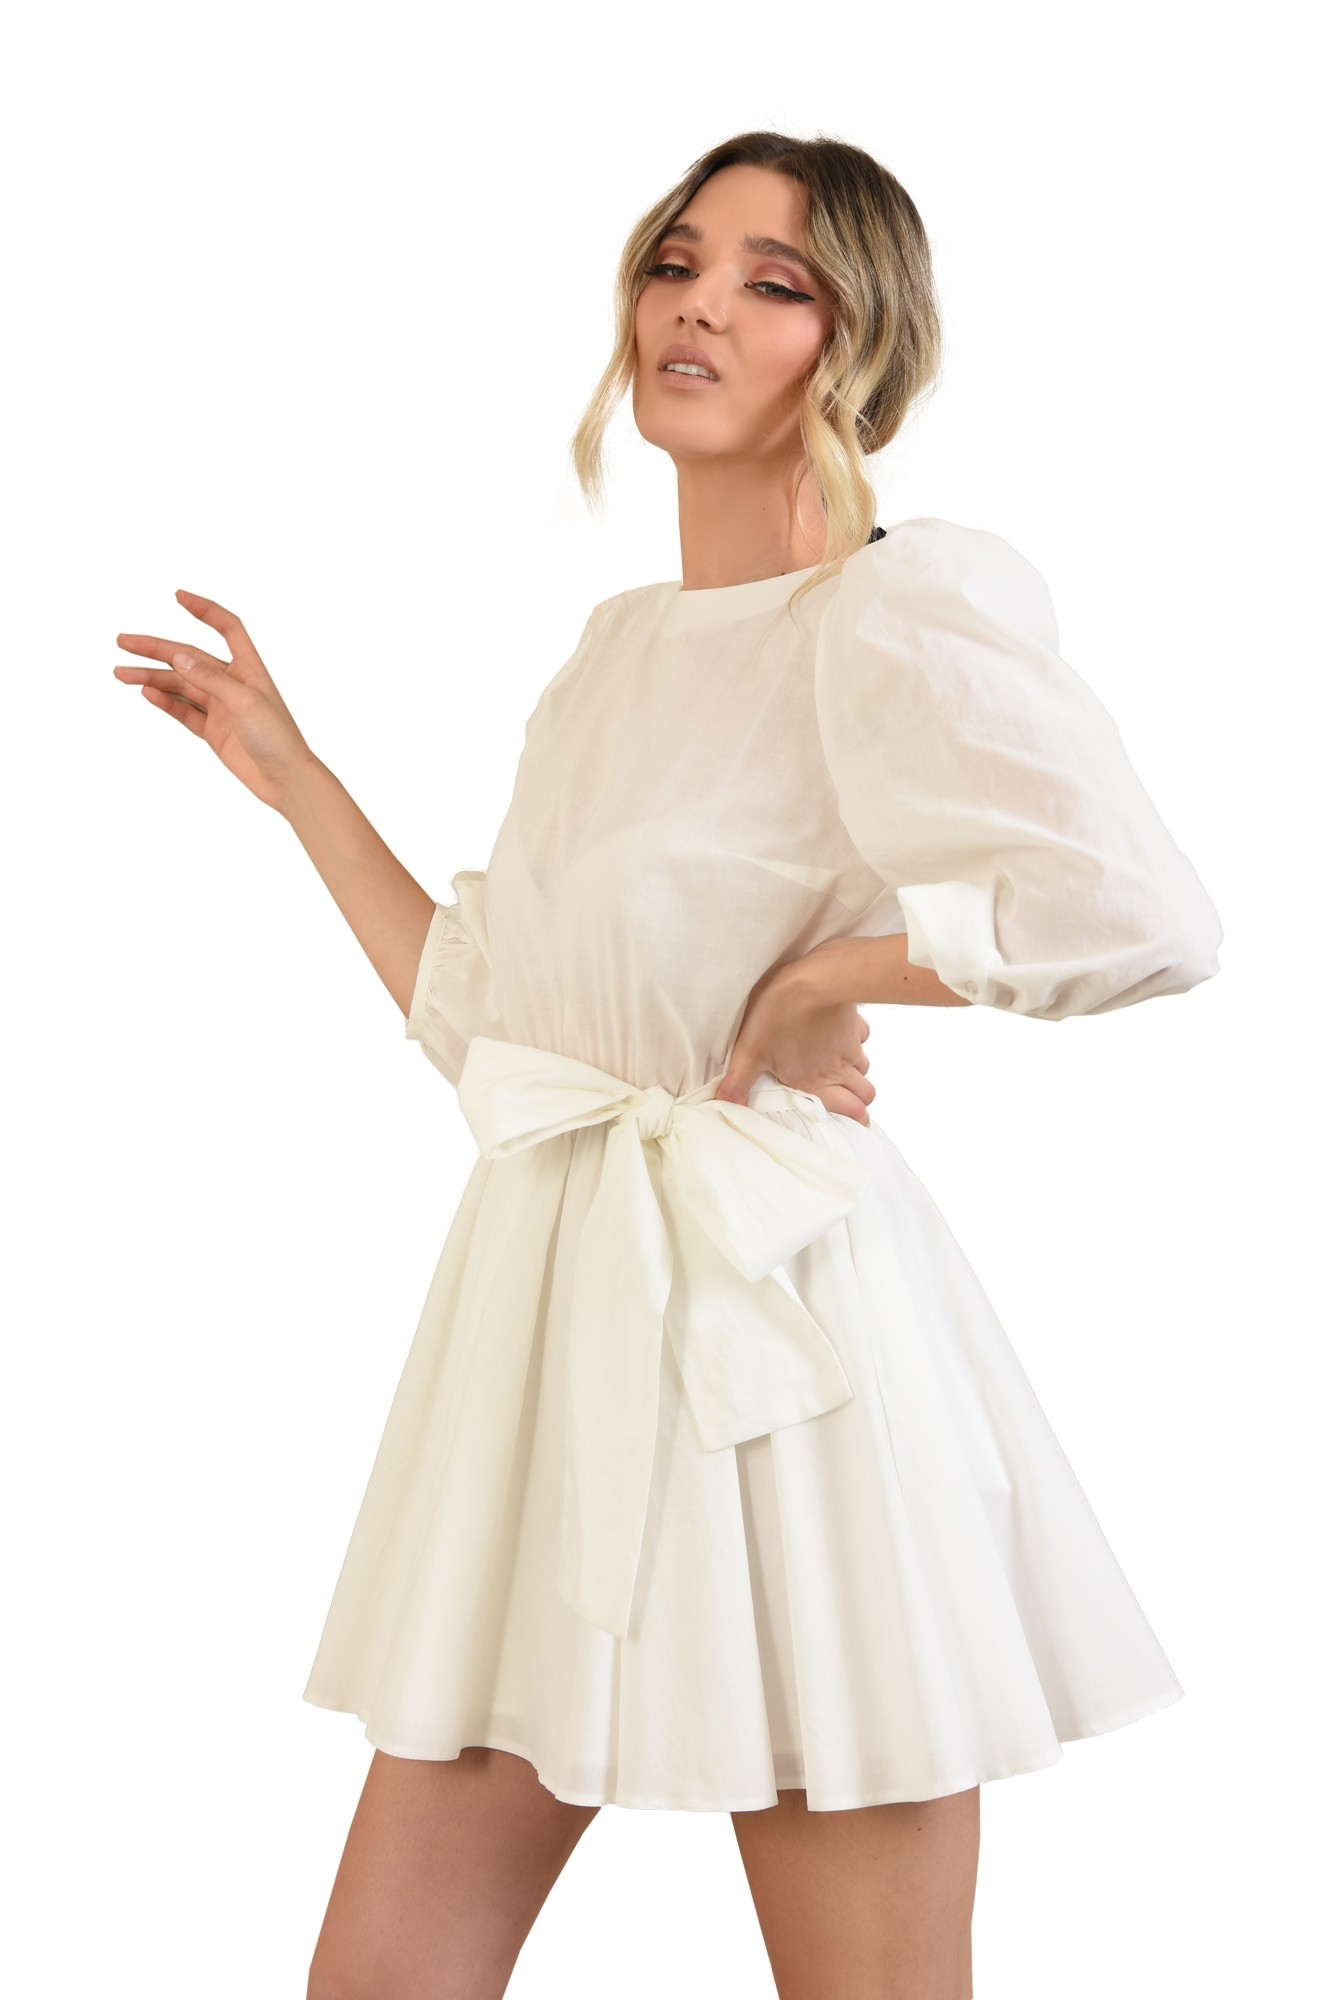 0 -  rochie casual, clos, scurta, cu cordon, maneci bufante, alb